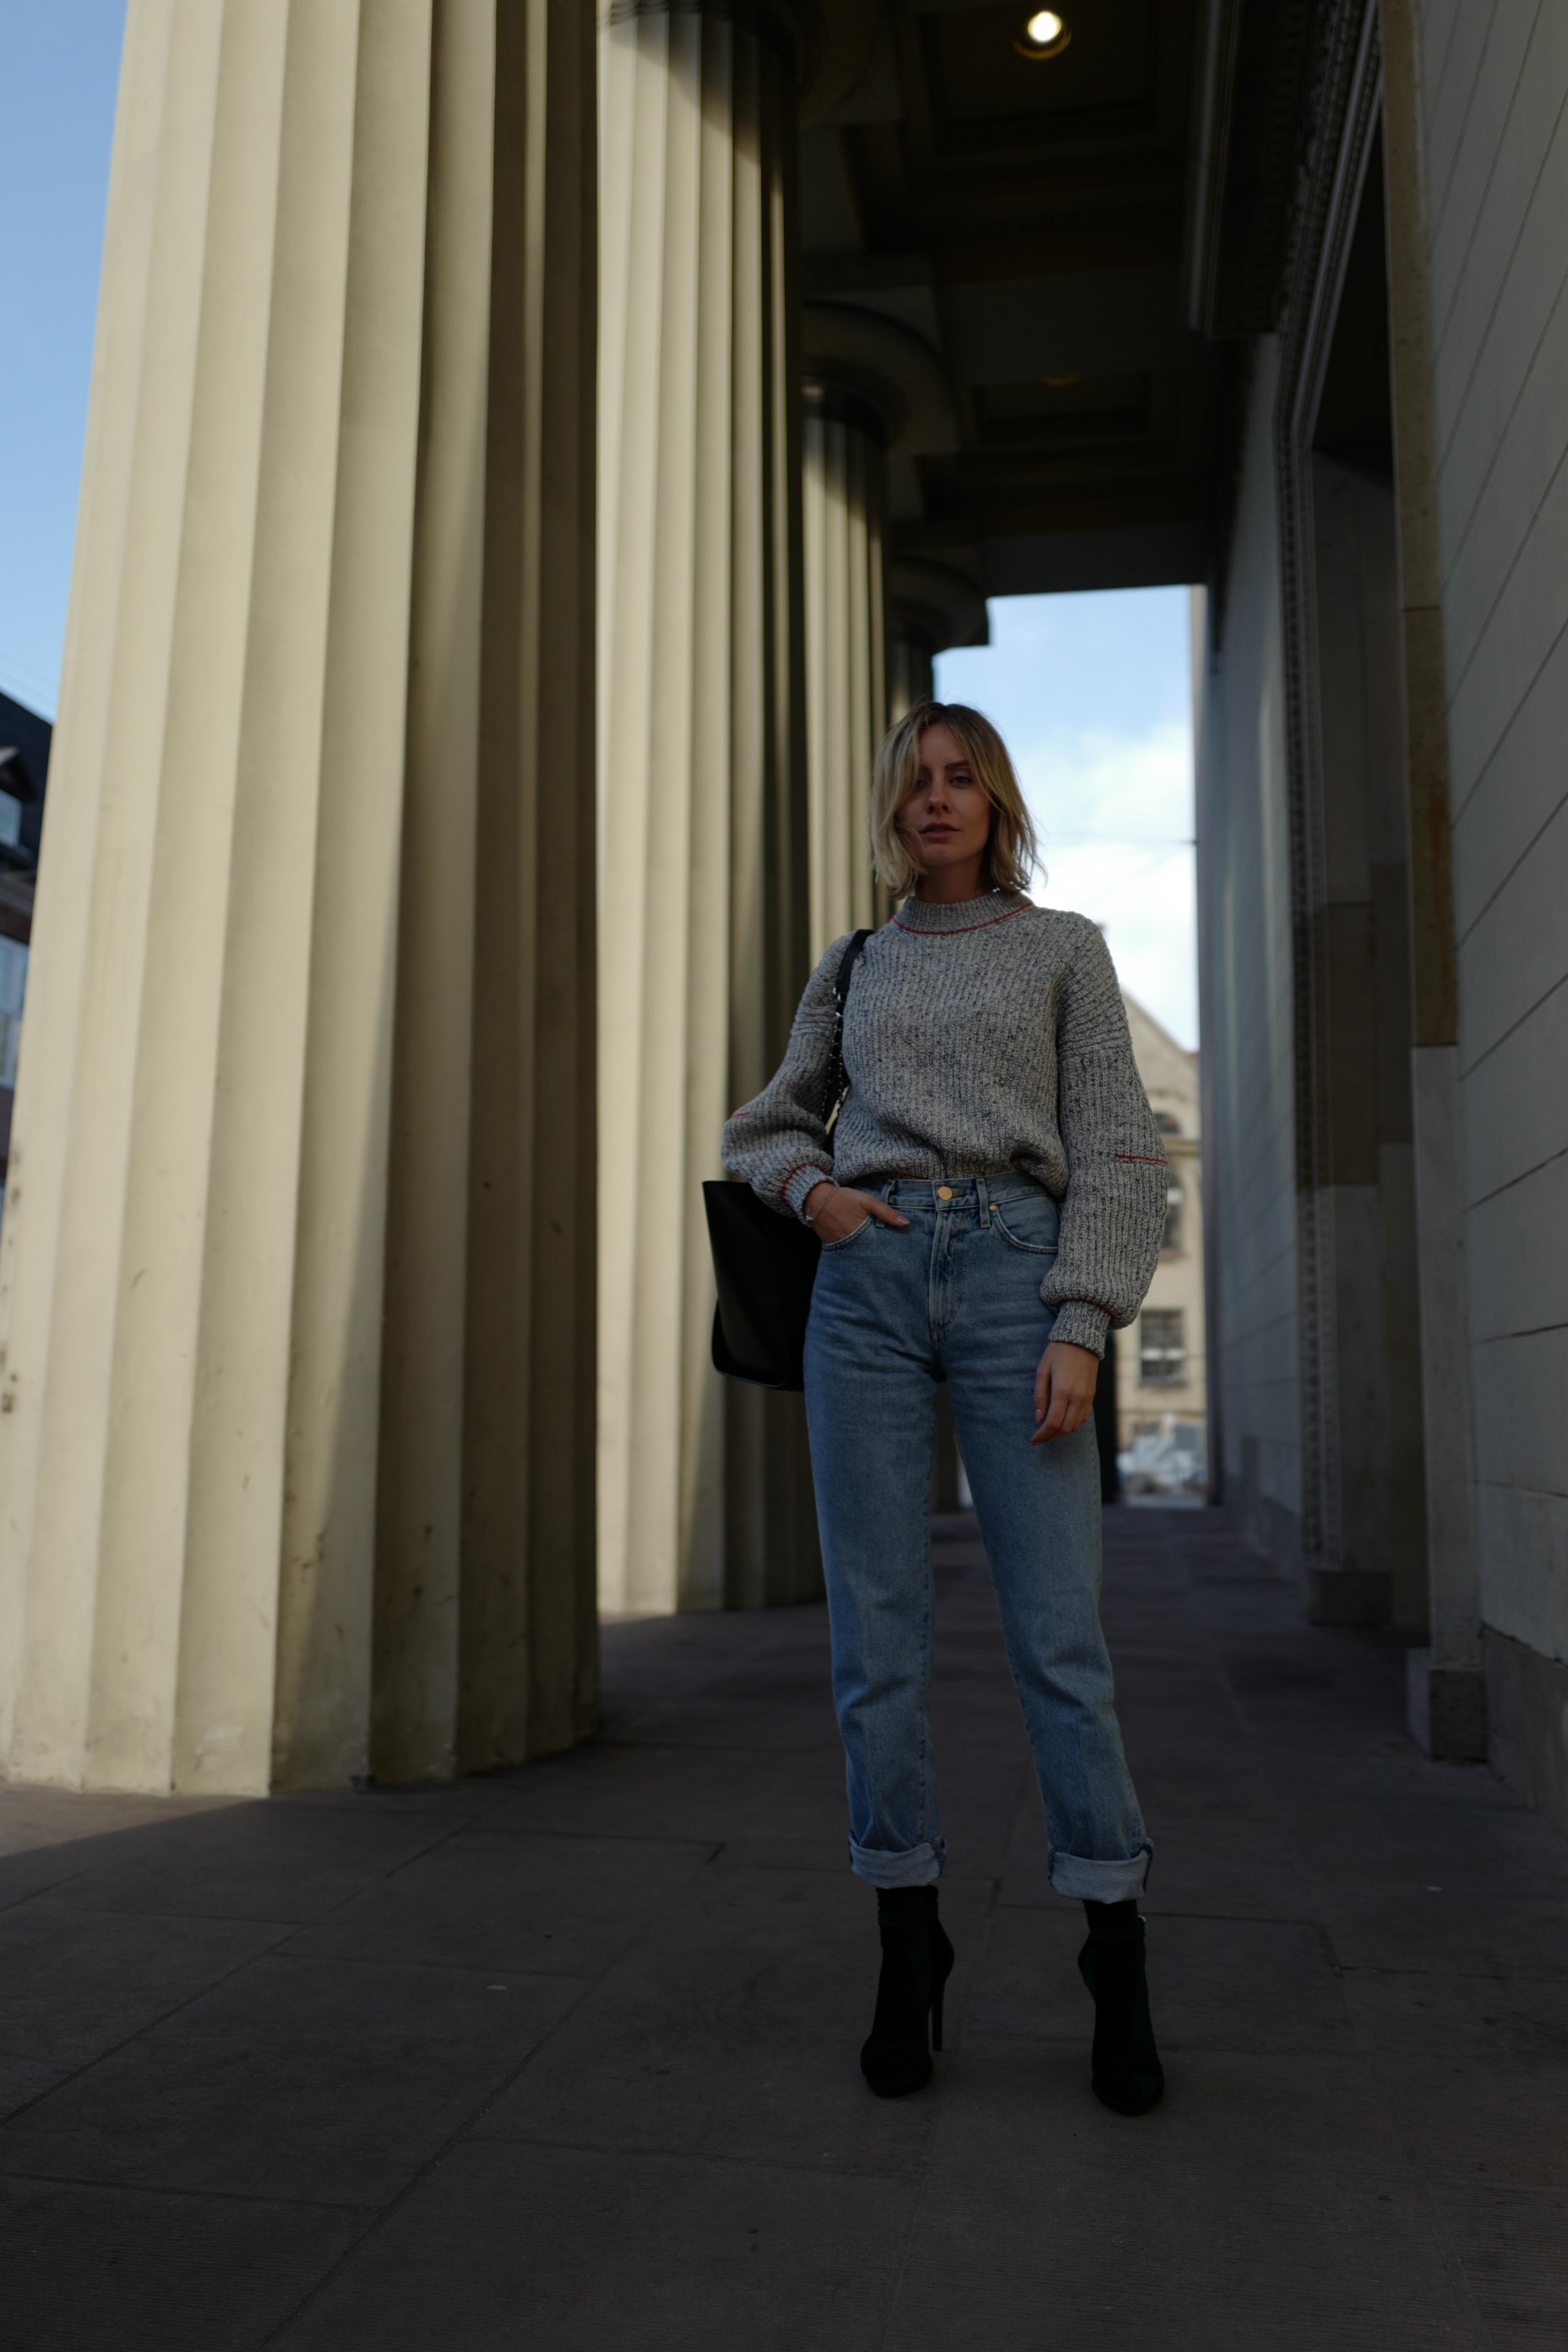 Tommy Hilfiger Gigi Hadid puffer jacket outfit lisa hahnbück fashion blogger